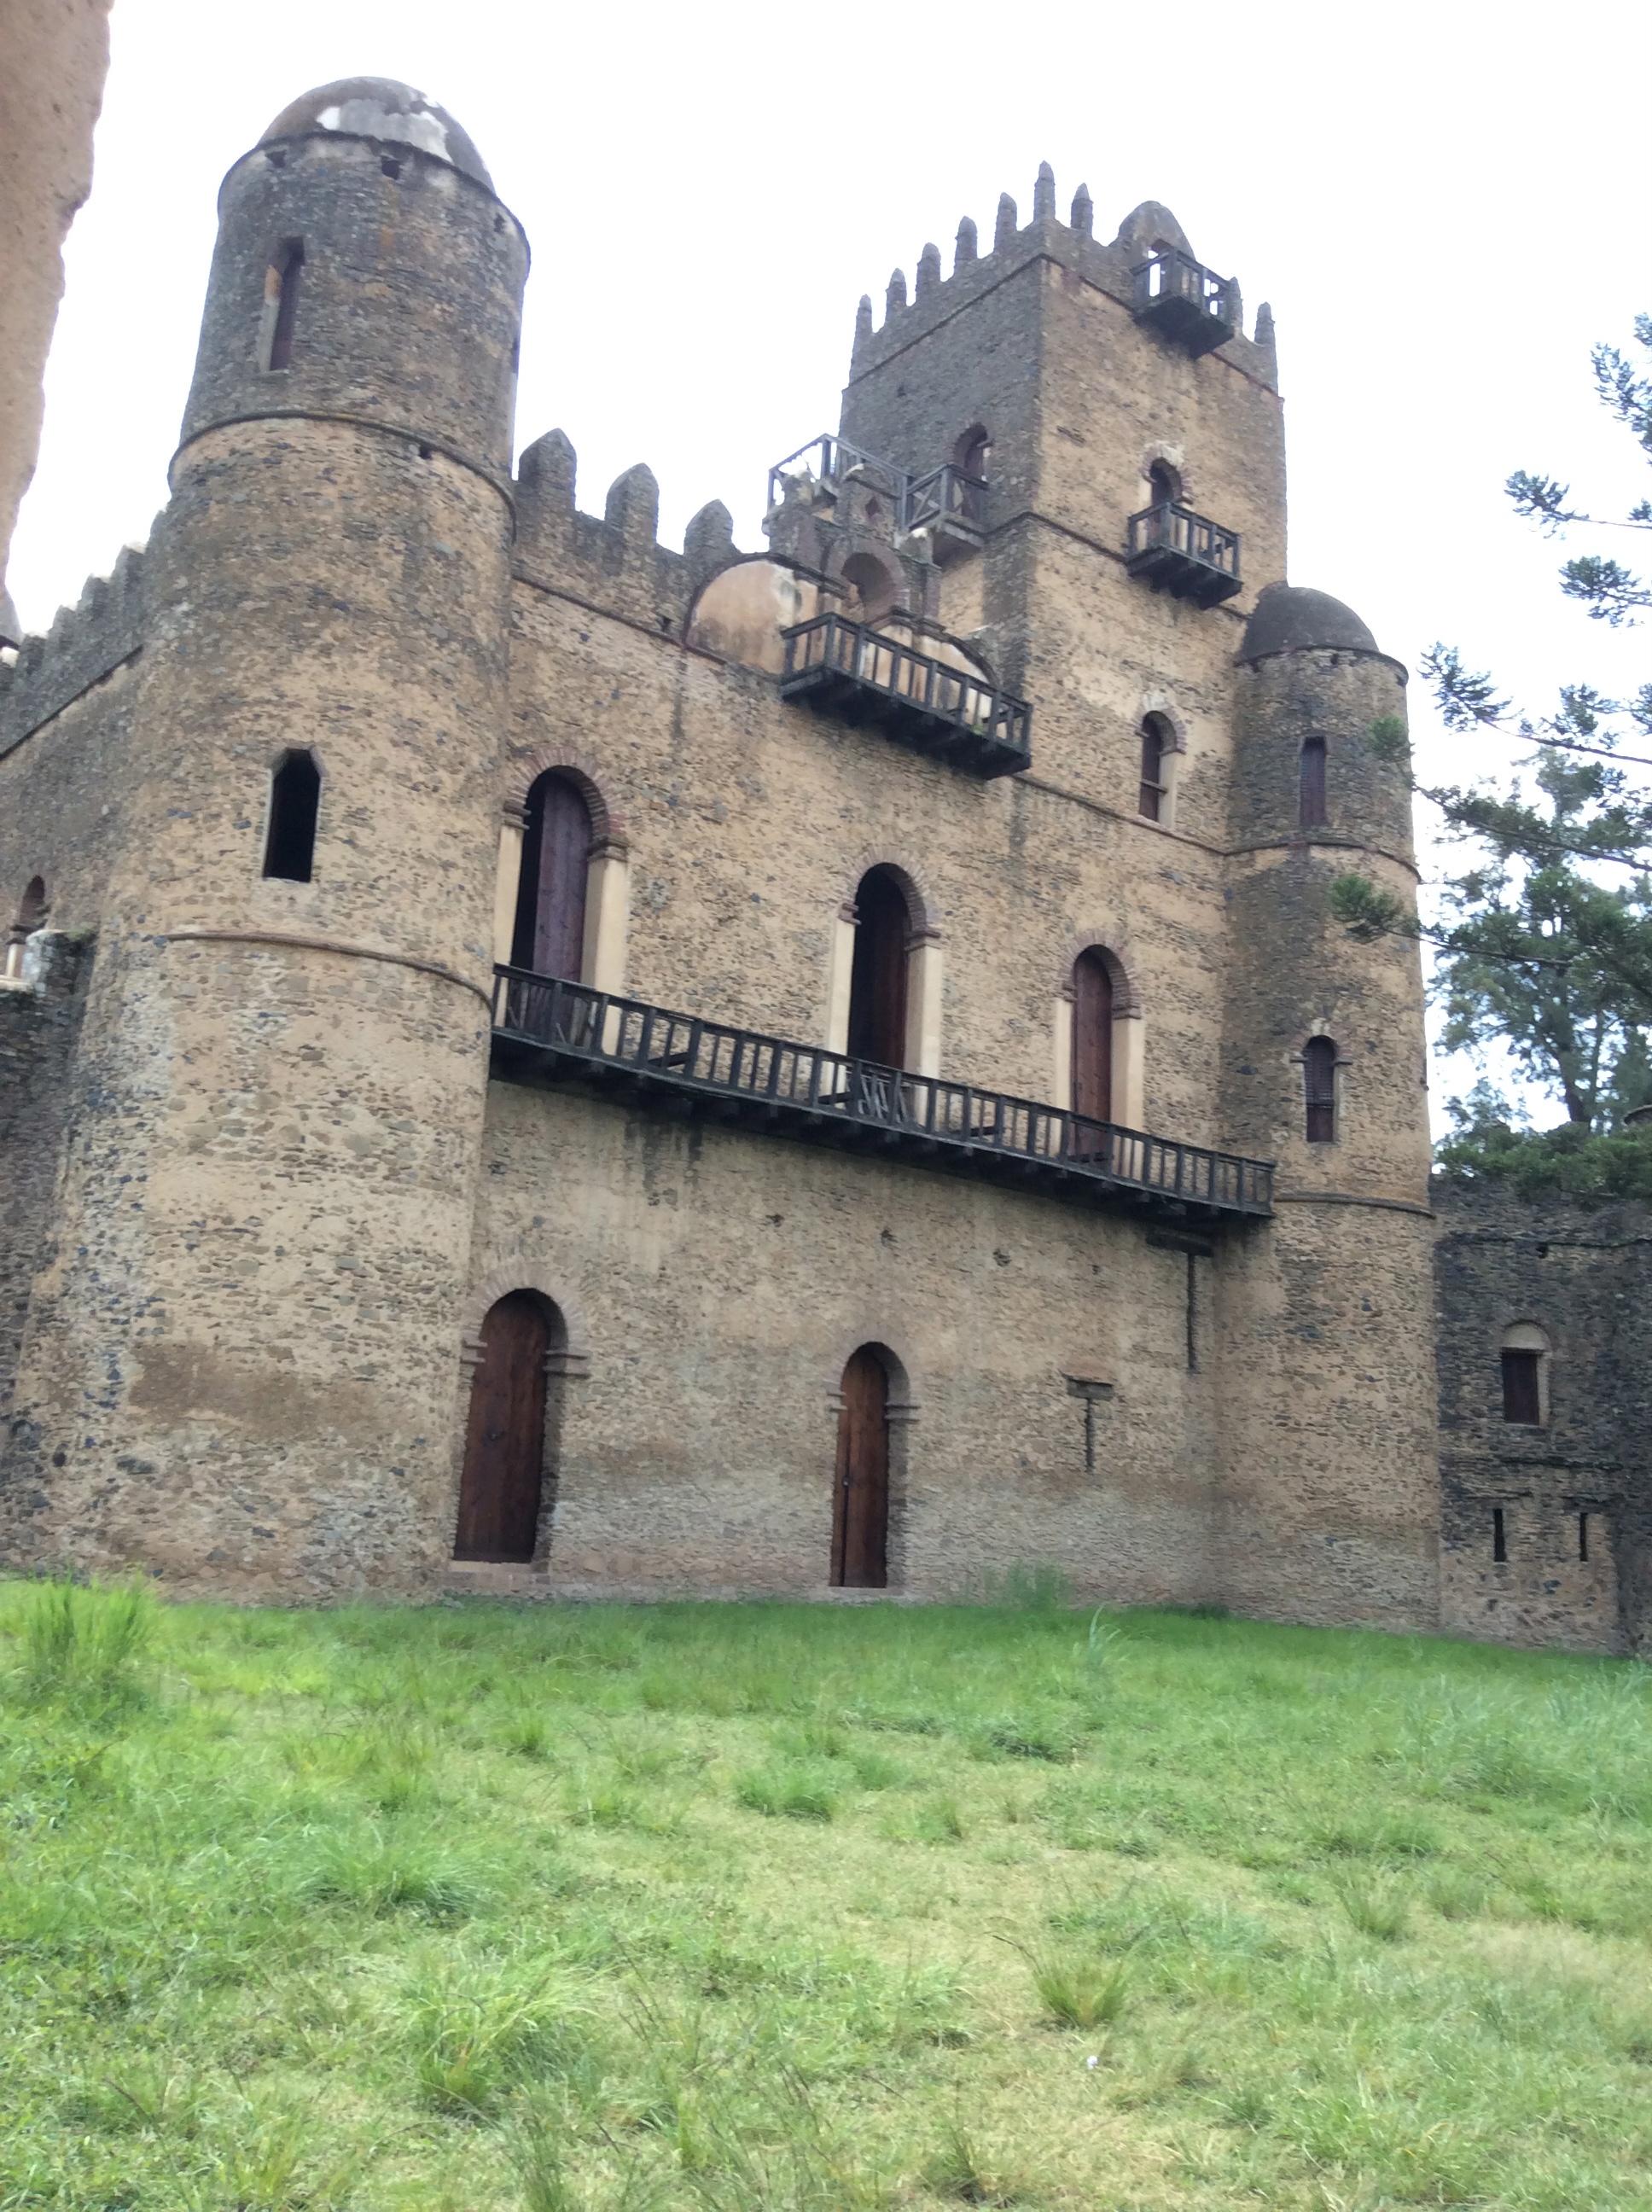 My Ethiopian Adventure: the Castles of Gonder | writingontherim